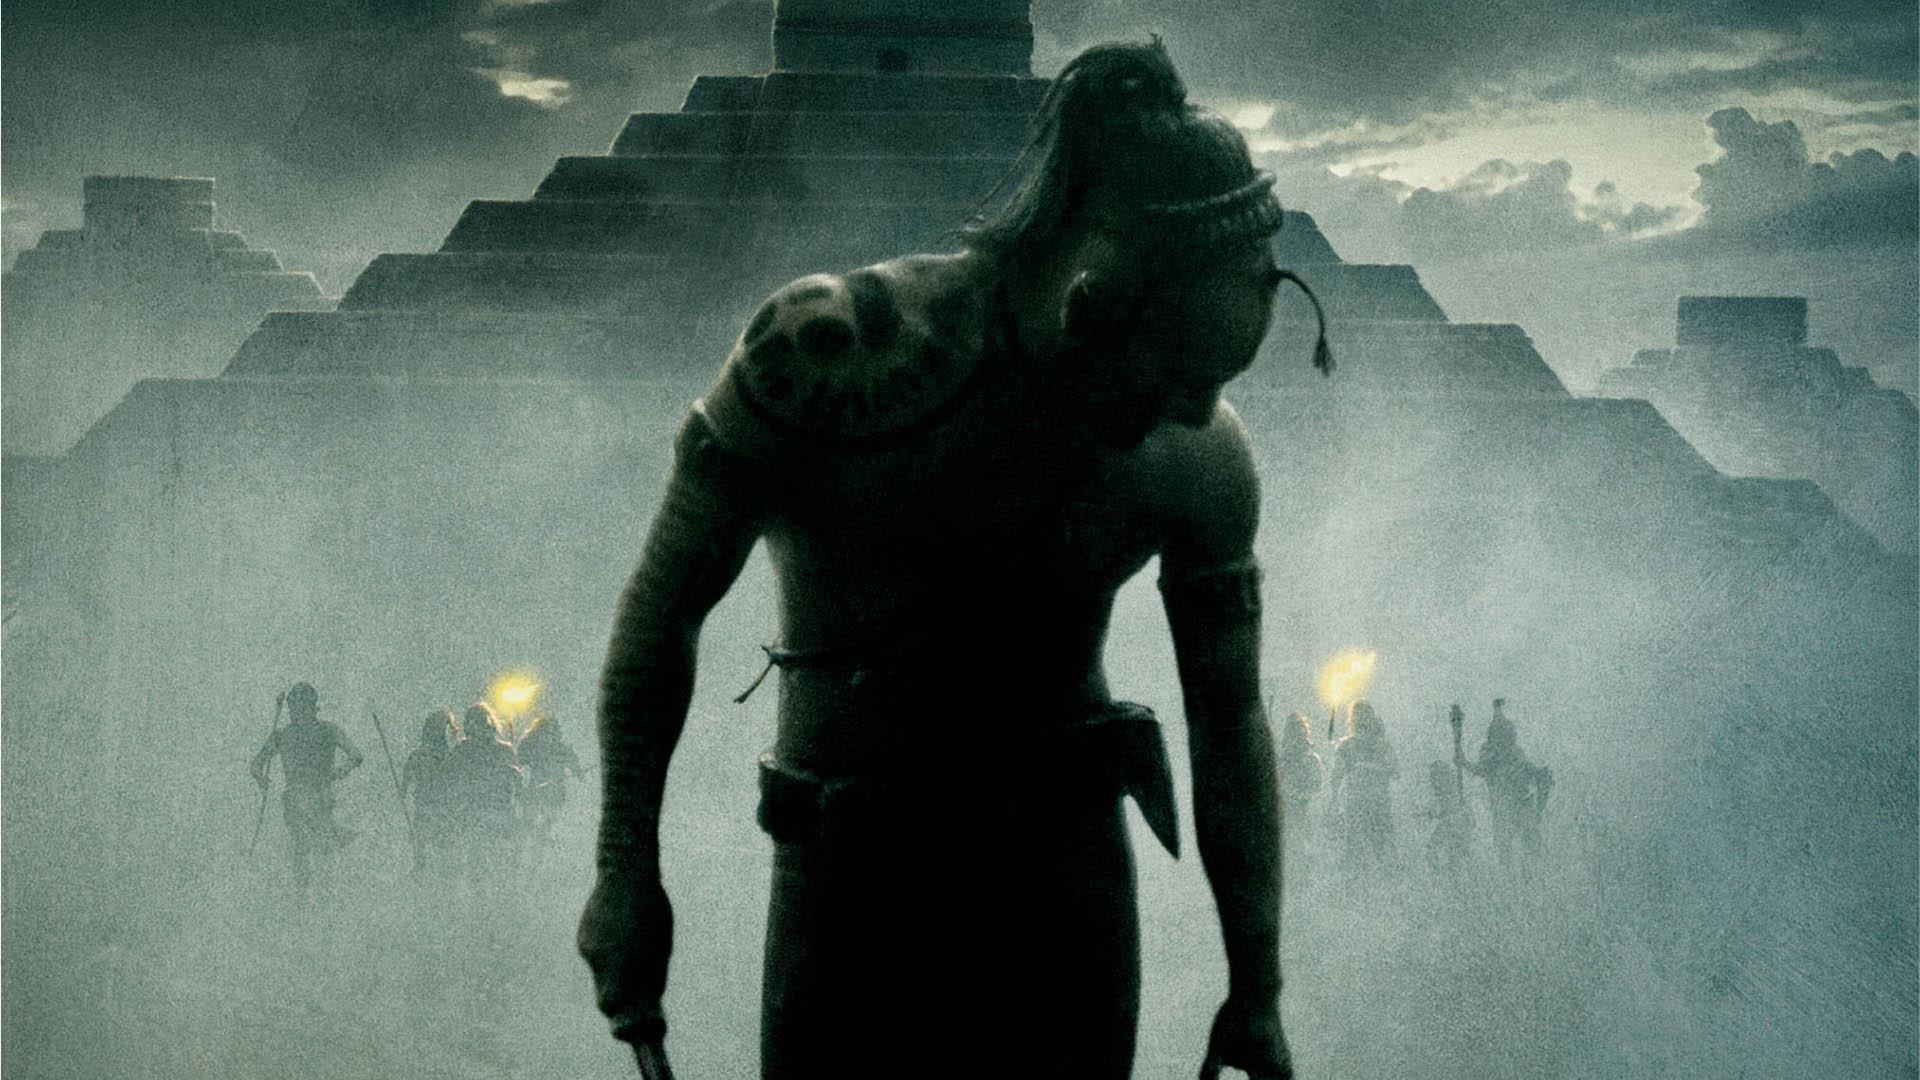 Wallpaper Sky Apocalypto Man Movie Darkness